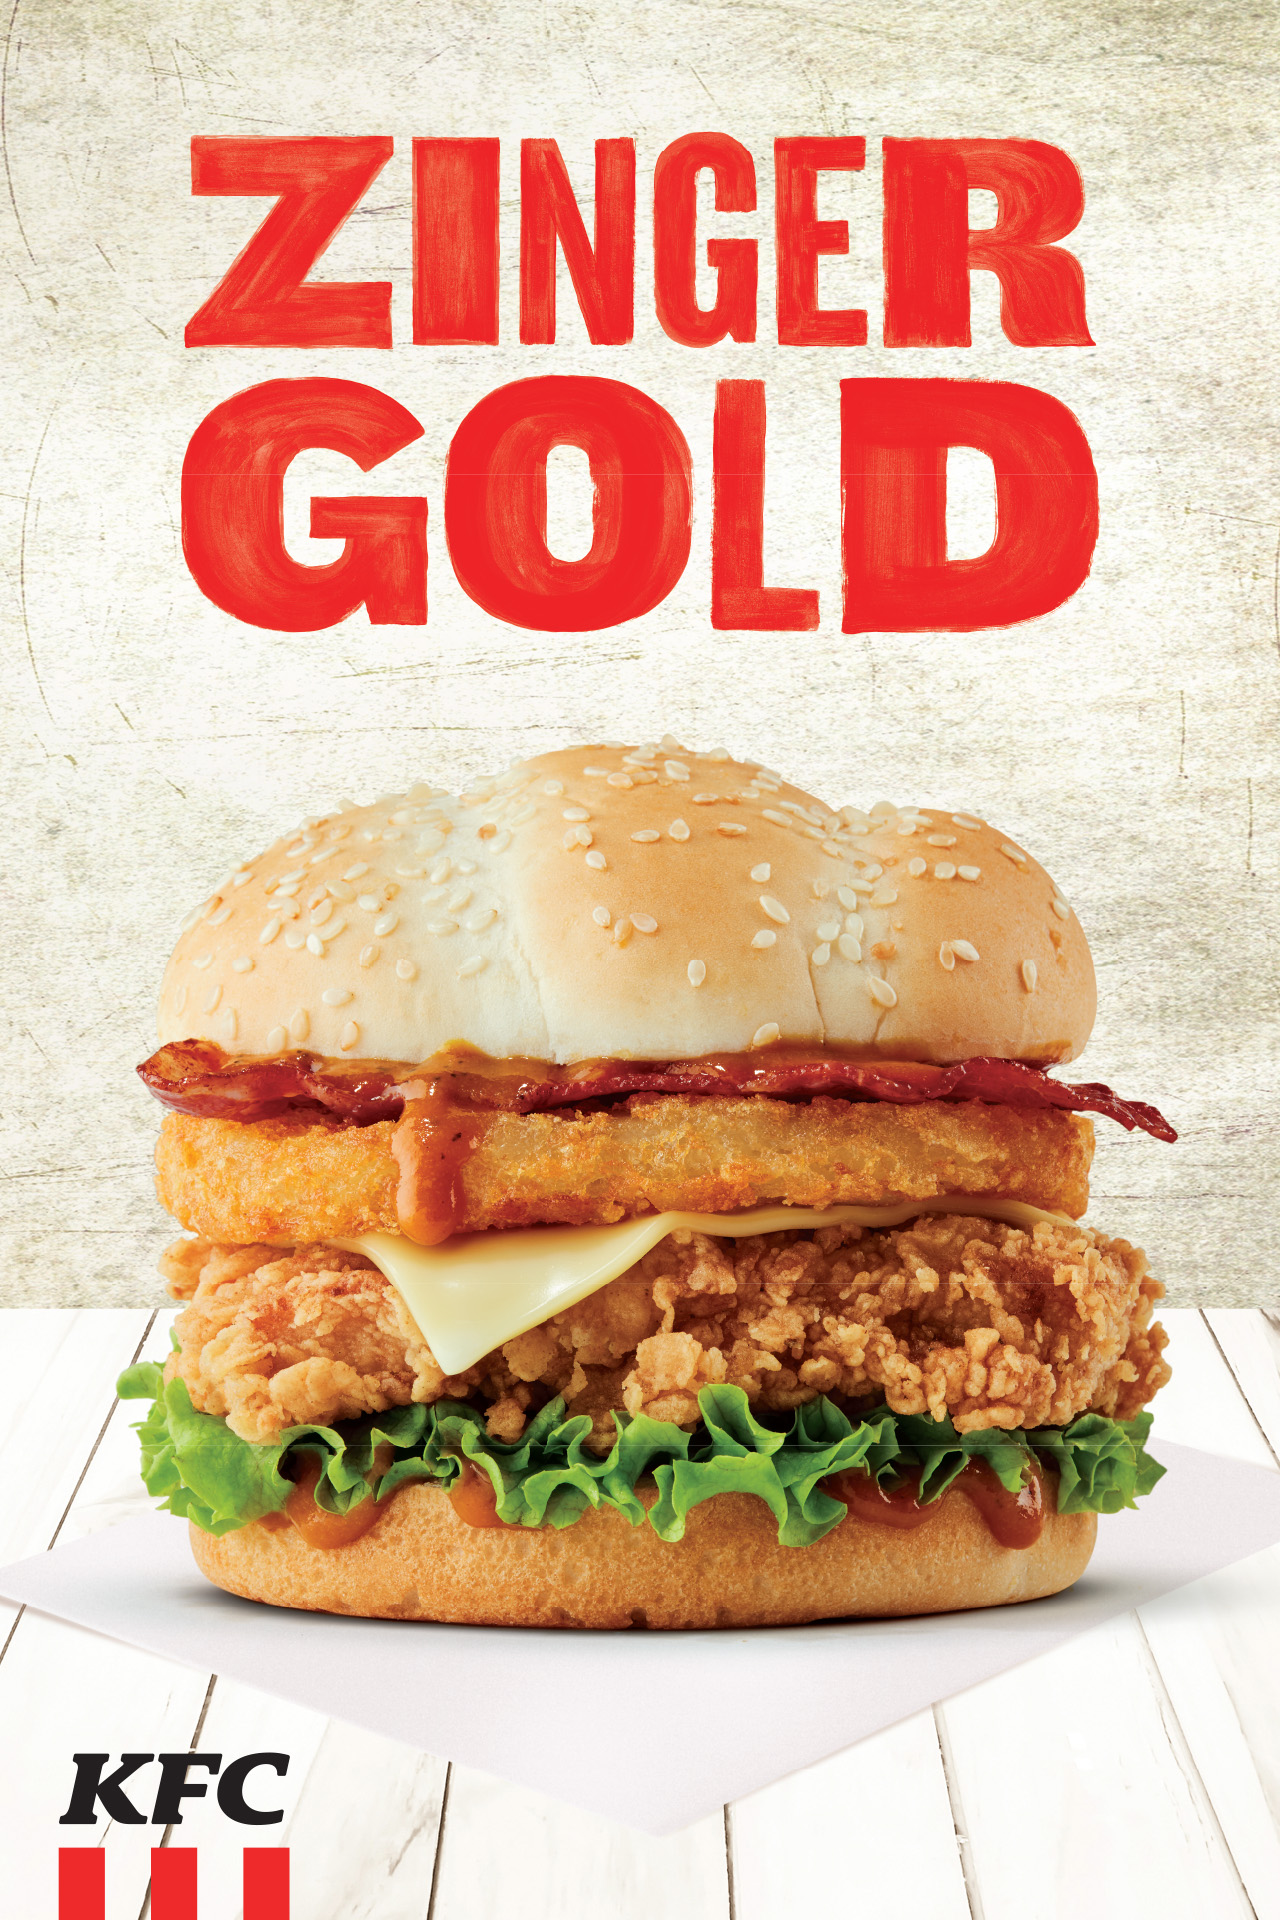 KFC1217 POD7 18' Zinger Gold Burger OOH 6x9m@10%_F.jpg